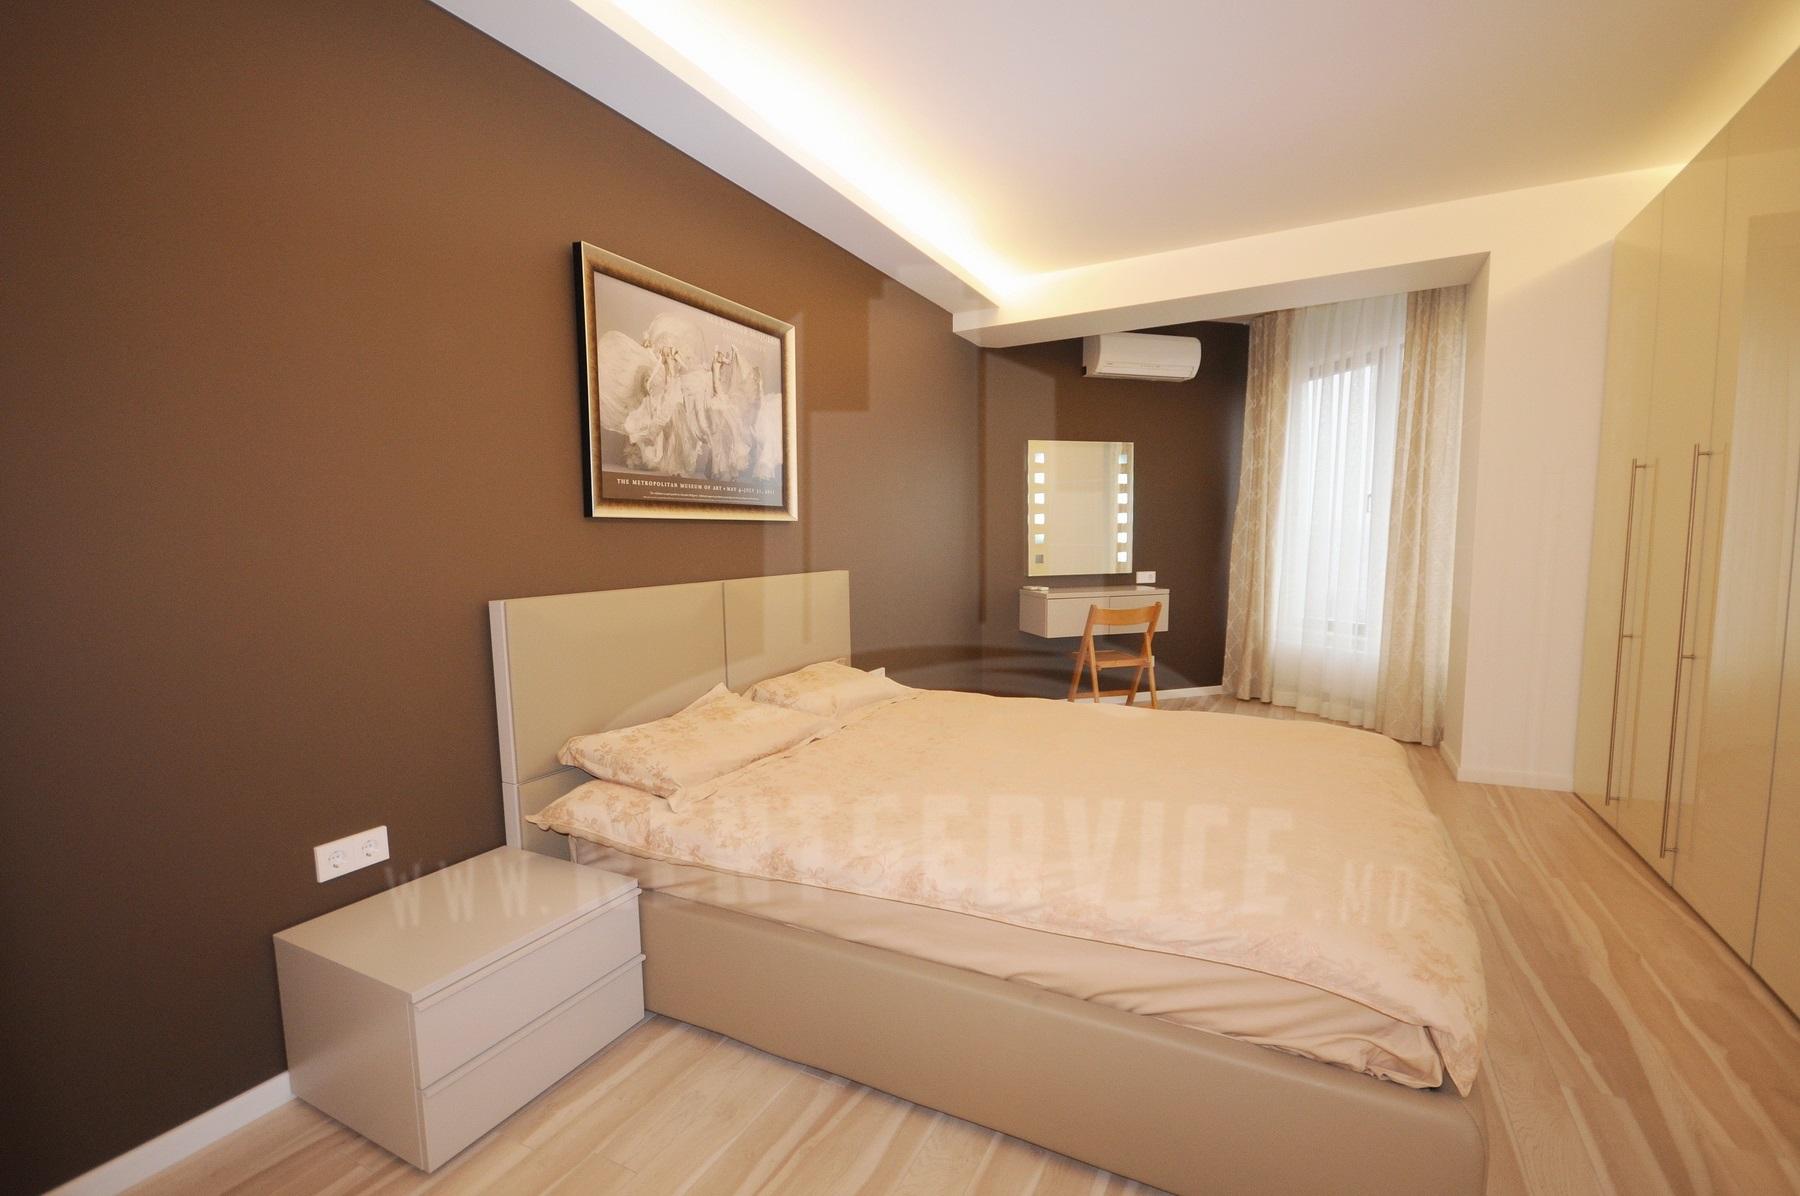 2060_apartment_12.JPG